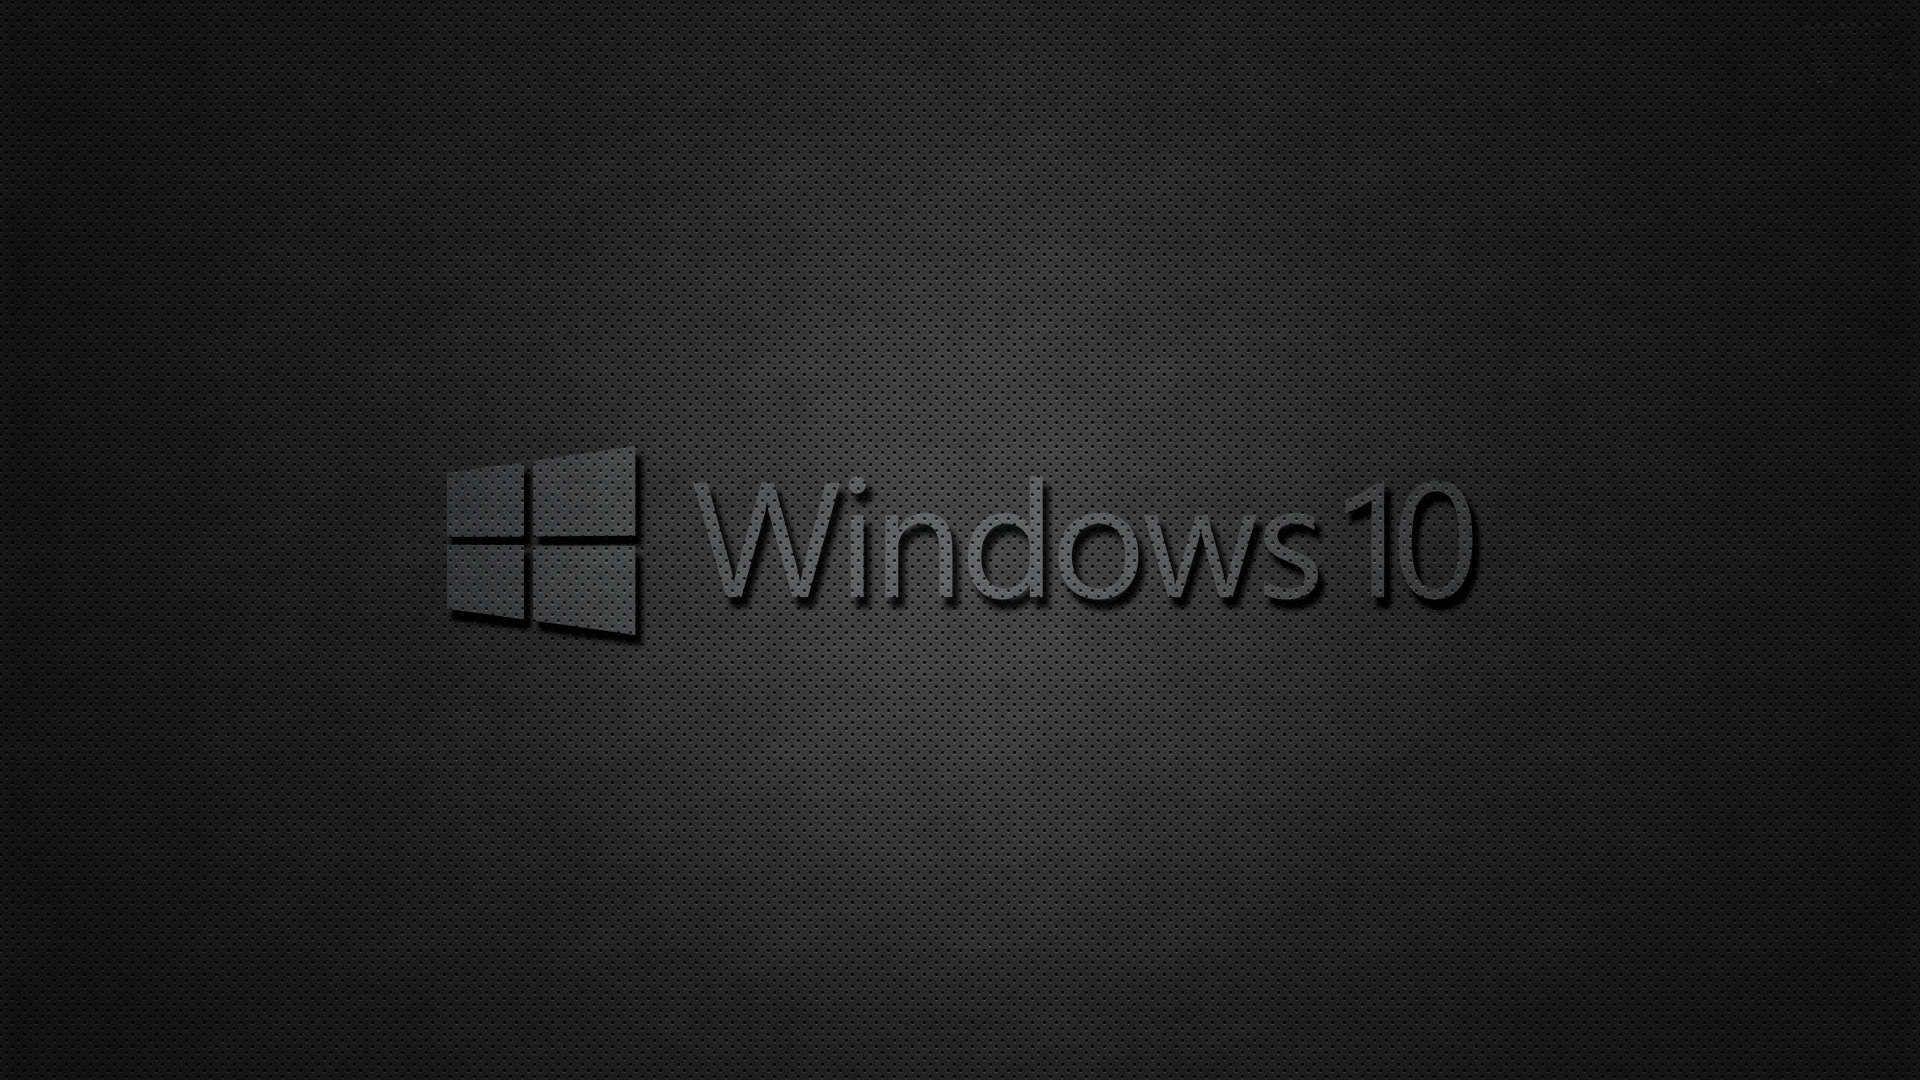 1920x1080 Black Windows 10 New Wallpaper Wallpaper Wallpaper Windows 10 Windows 10 Windows Wallpaper